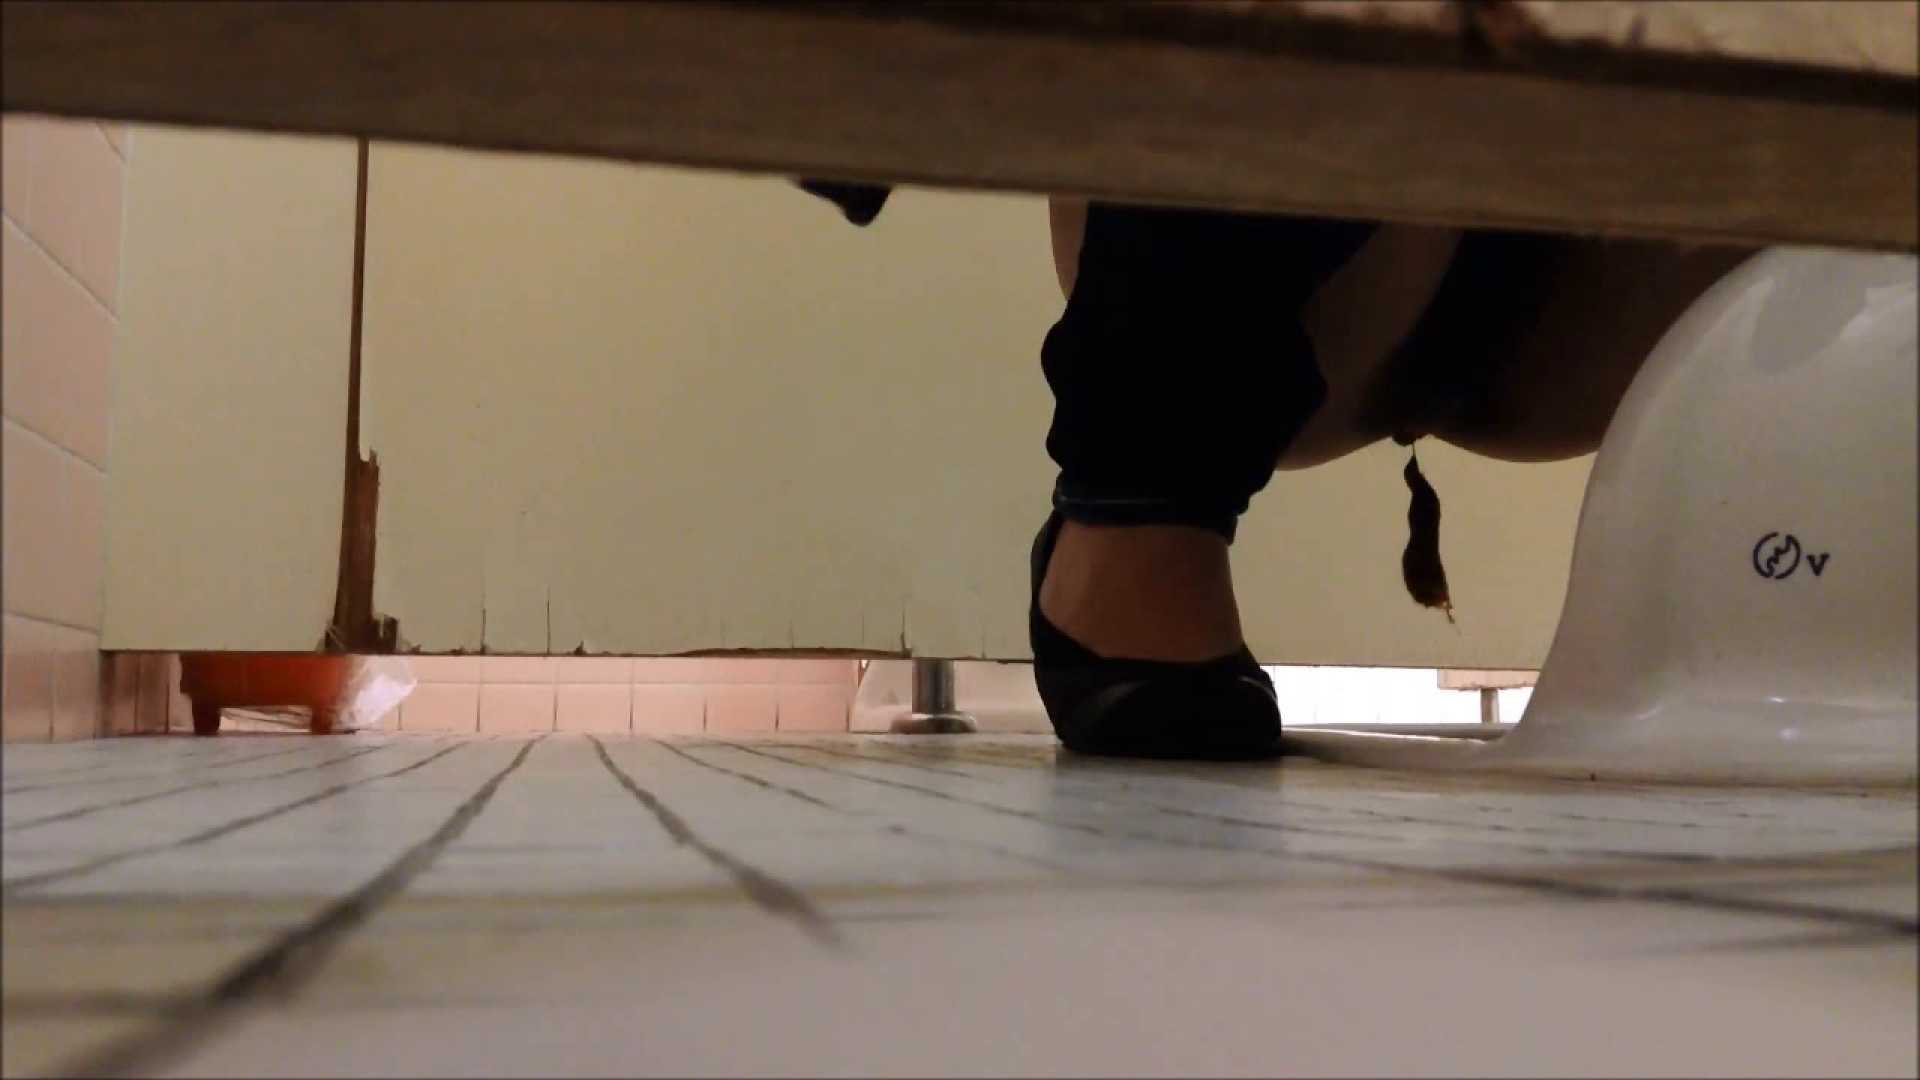 某有名大学女性洗面所 vol.06 和式 のぞき 80PIX 69